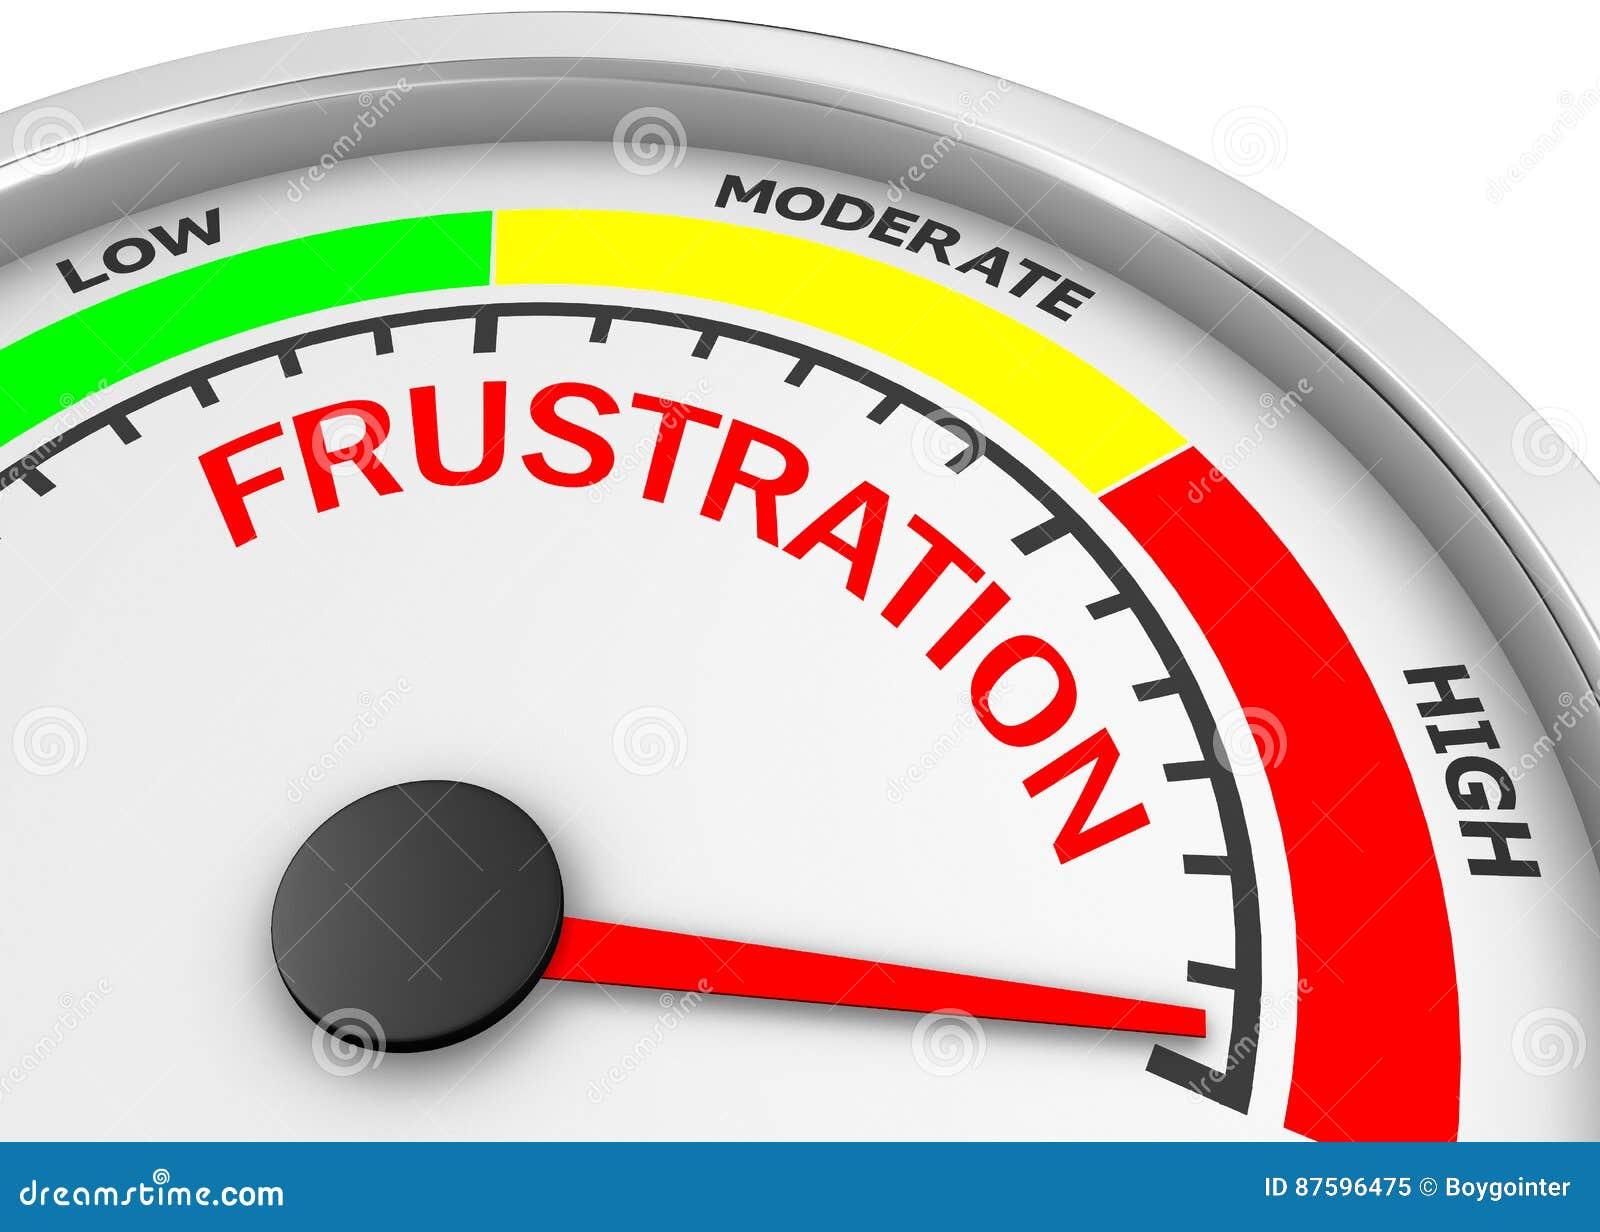 Frustration Stock Illustrations – 19,379 Frustration Stock Illustrations, Vectors & Clipart - Dreamstime